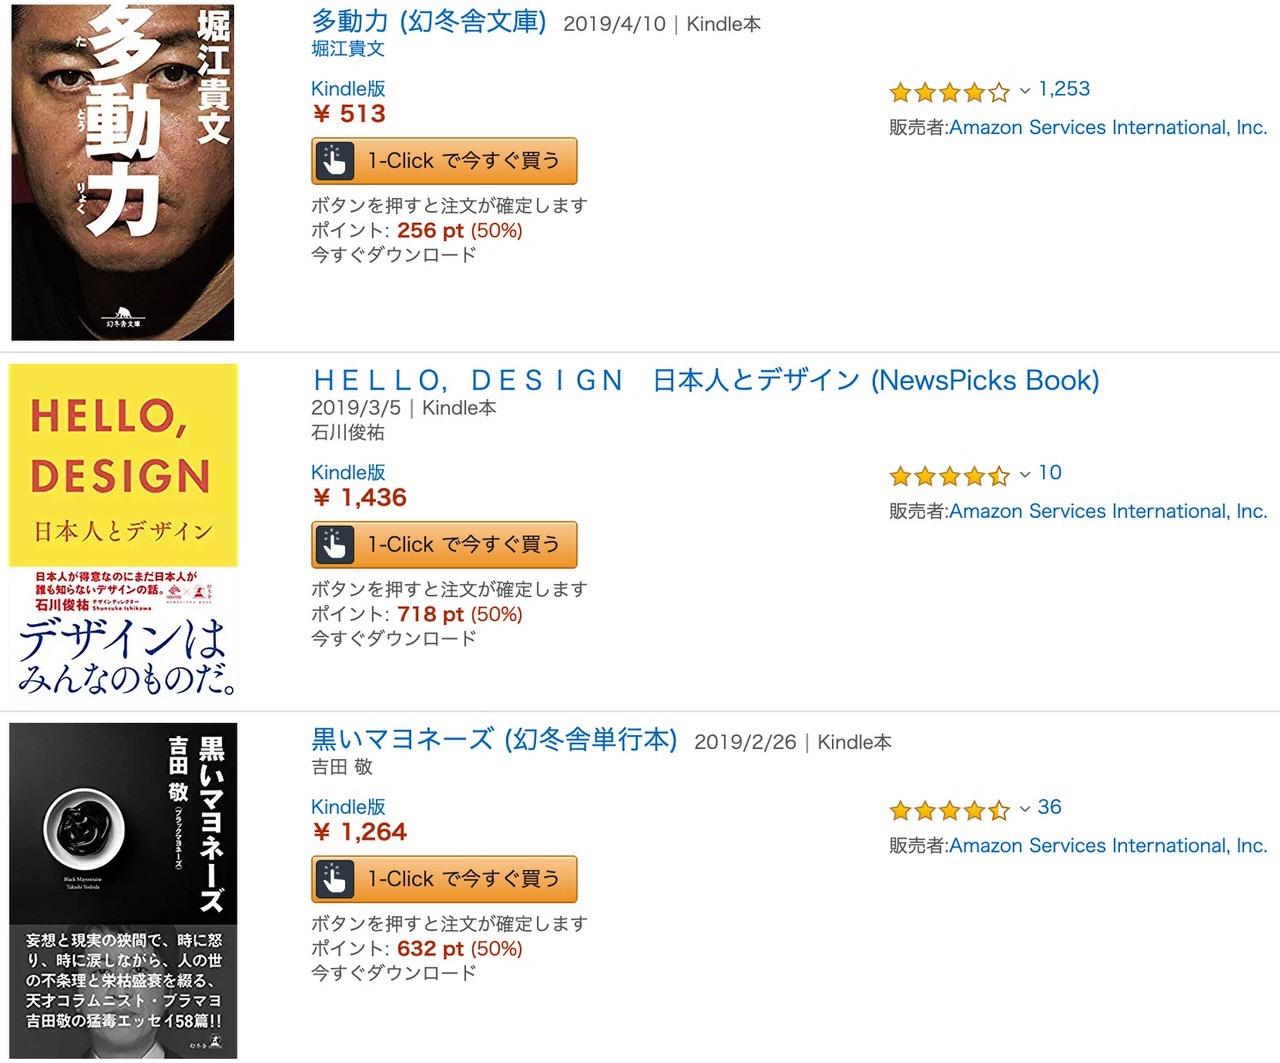 【Kindleセール】50%ポイント還元!3,500冊以上が対象の大型セール「幻冬舎フェア」(6/27まで)